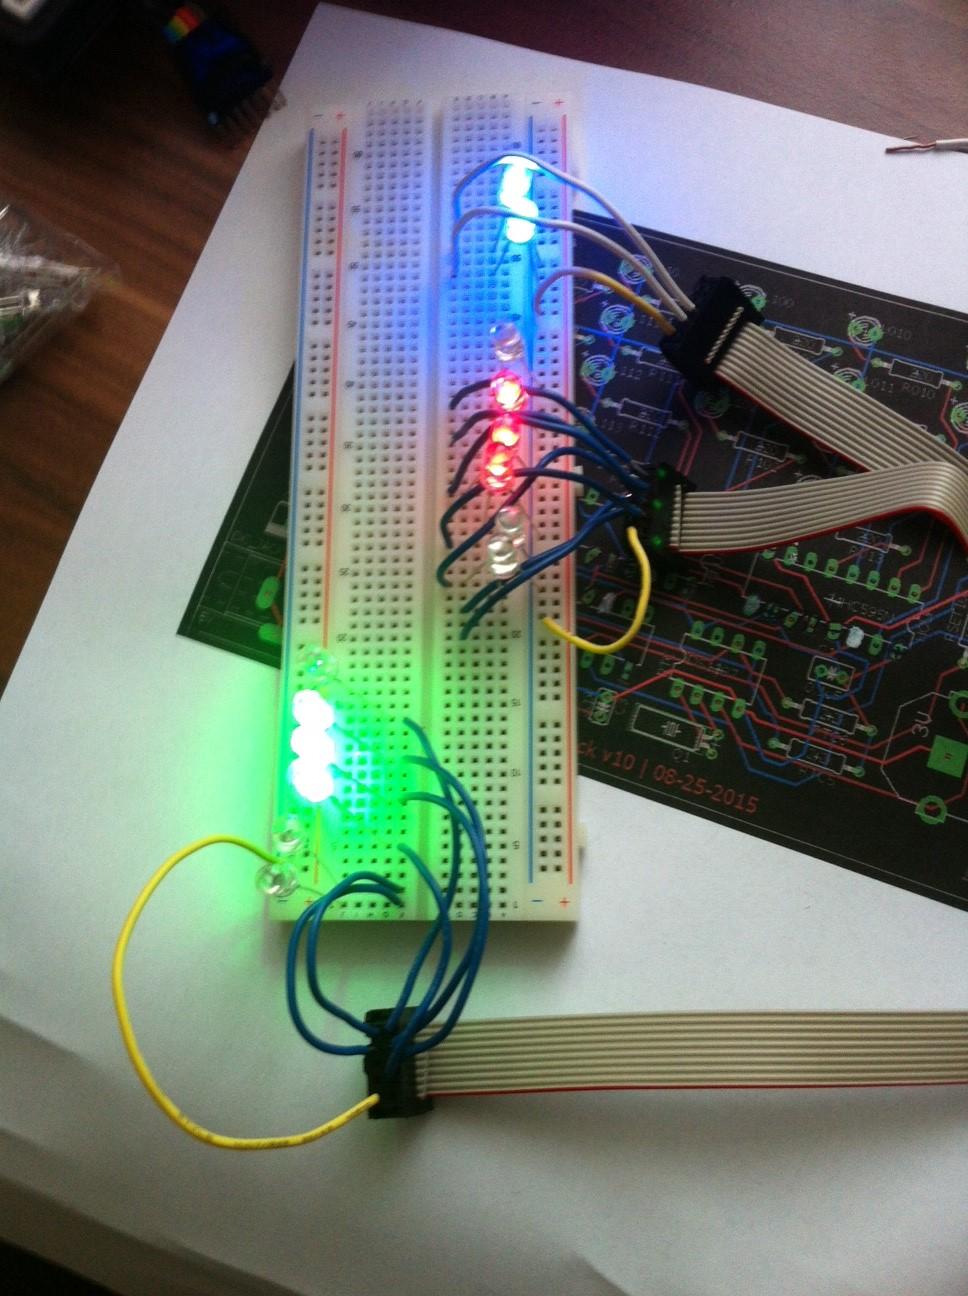 Binär uhr projekt arduino mikrocontroller